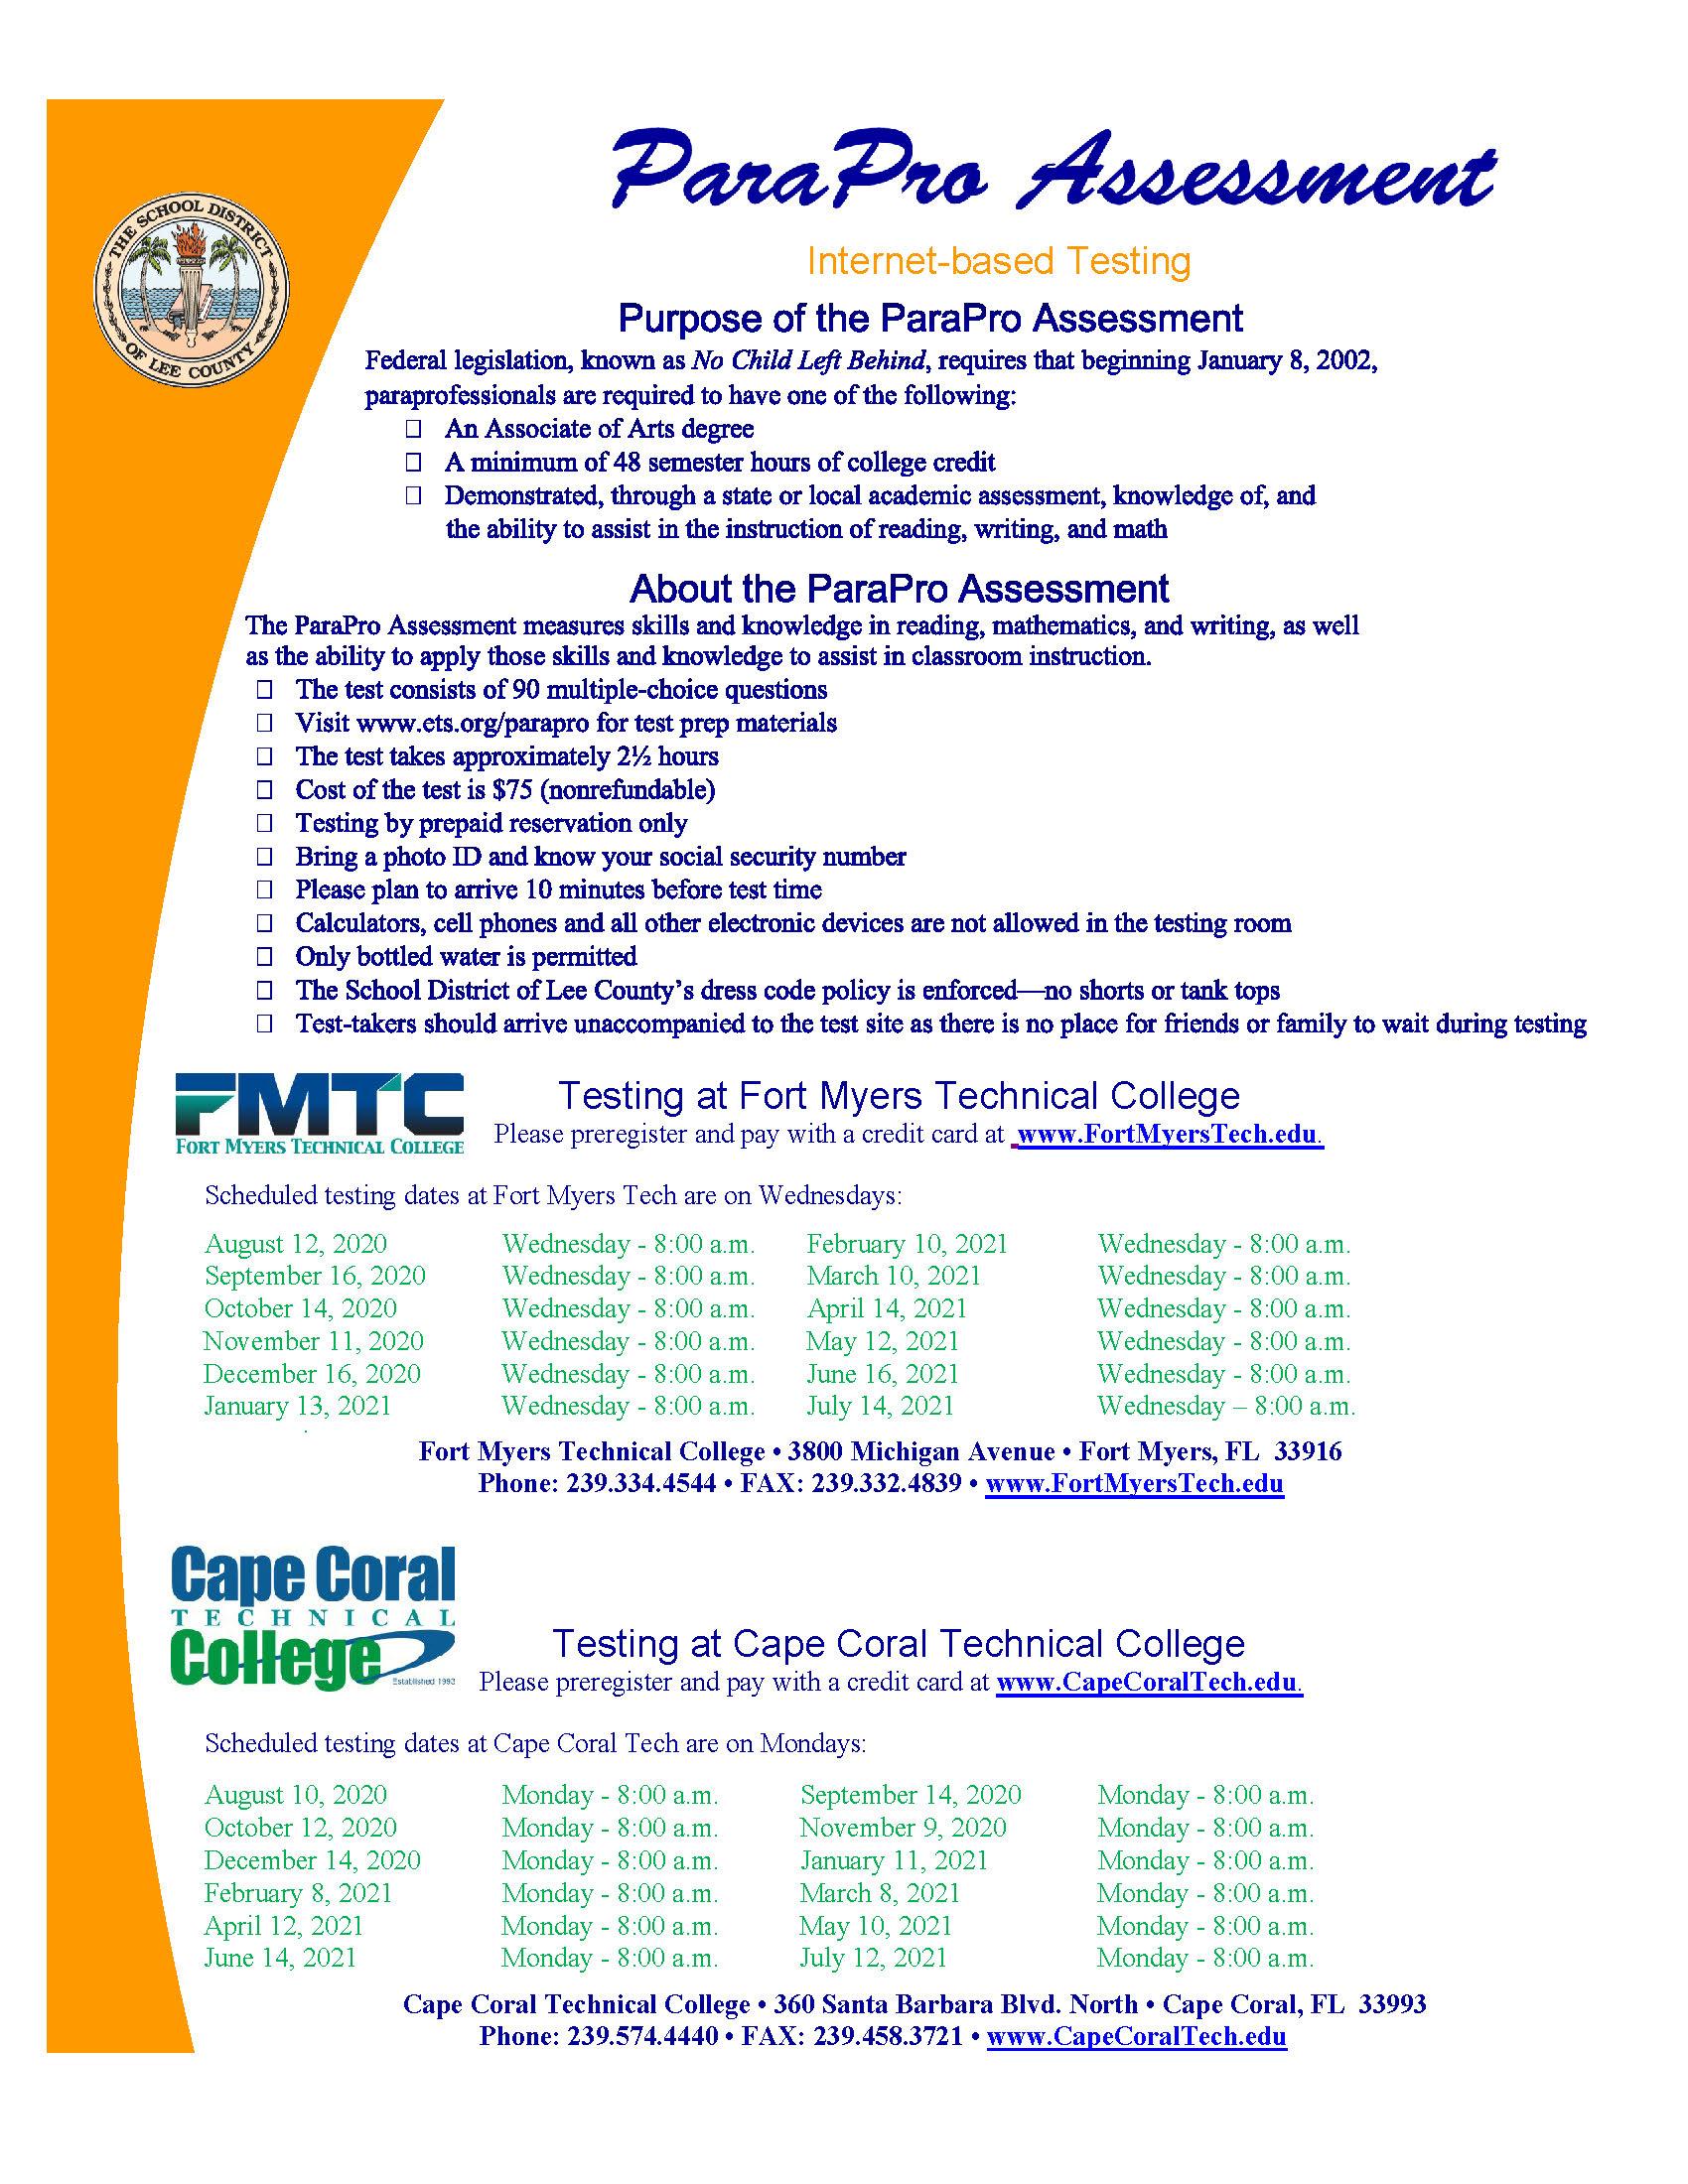 Parapro Testing Schedule